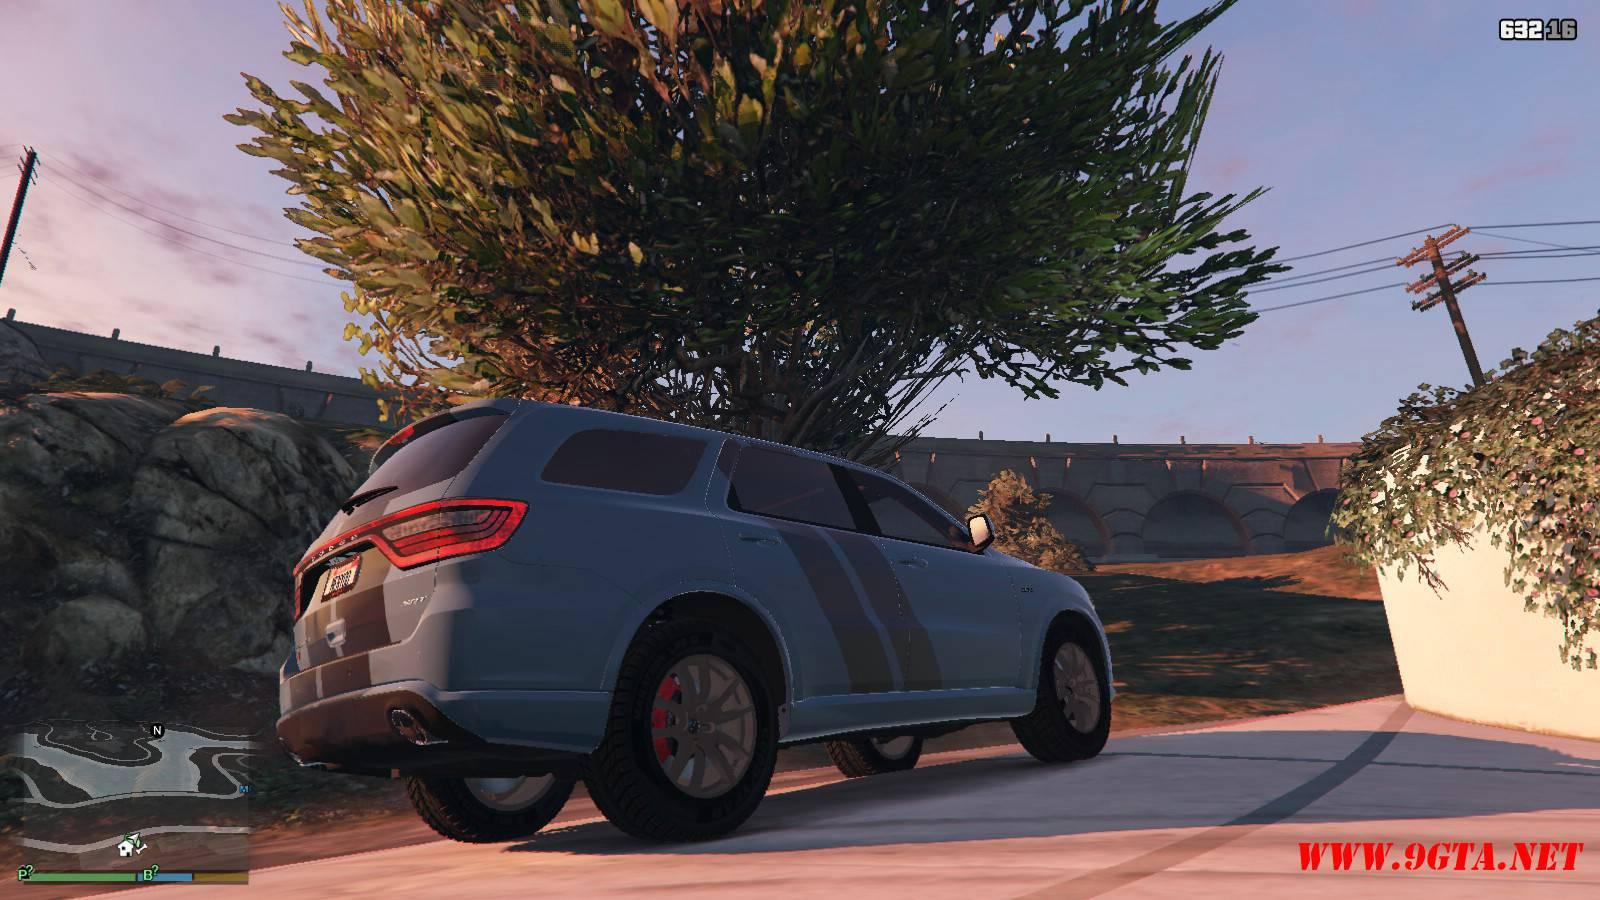 2018 Dodge Durango SRT v1.9.1 GTA5 Mods (9)